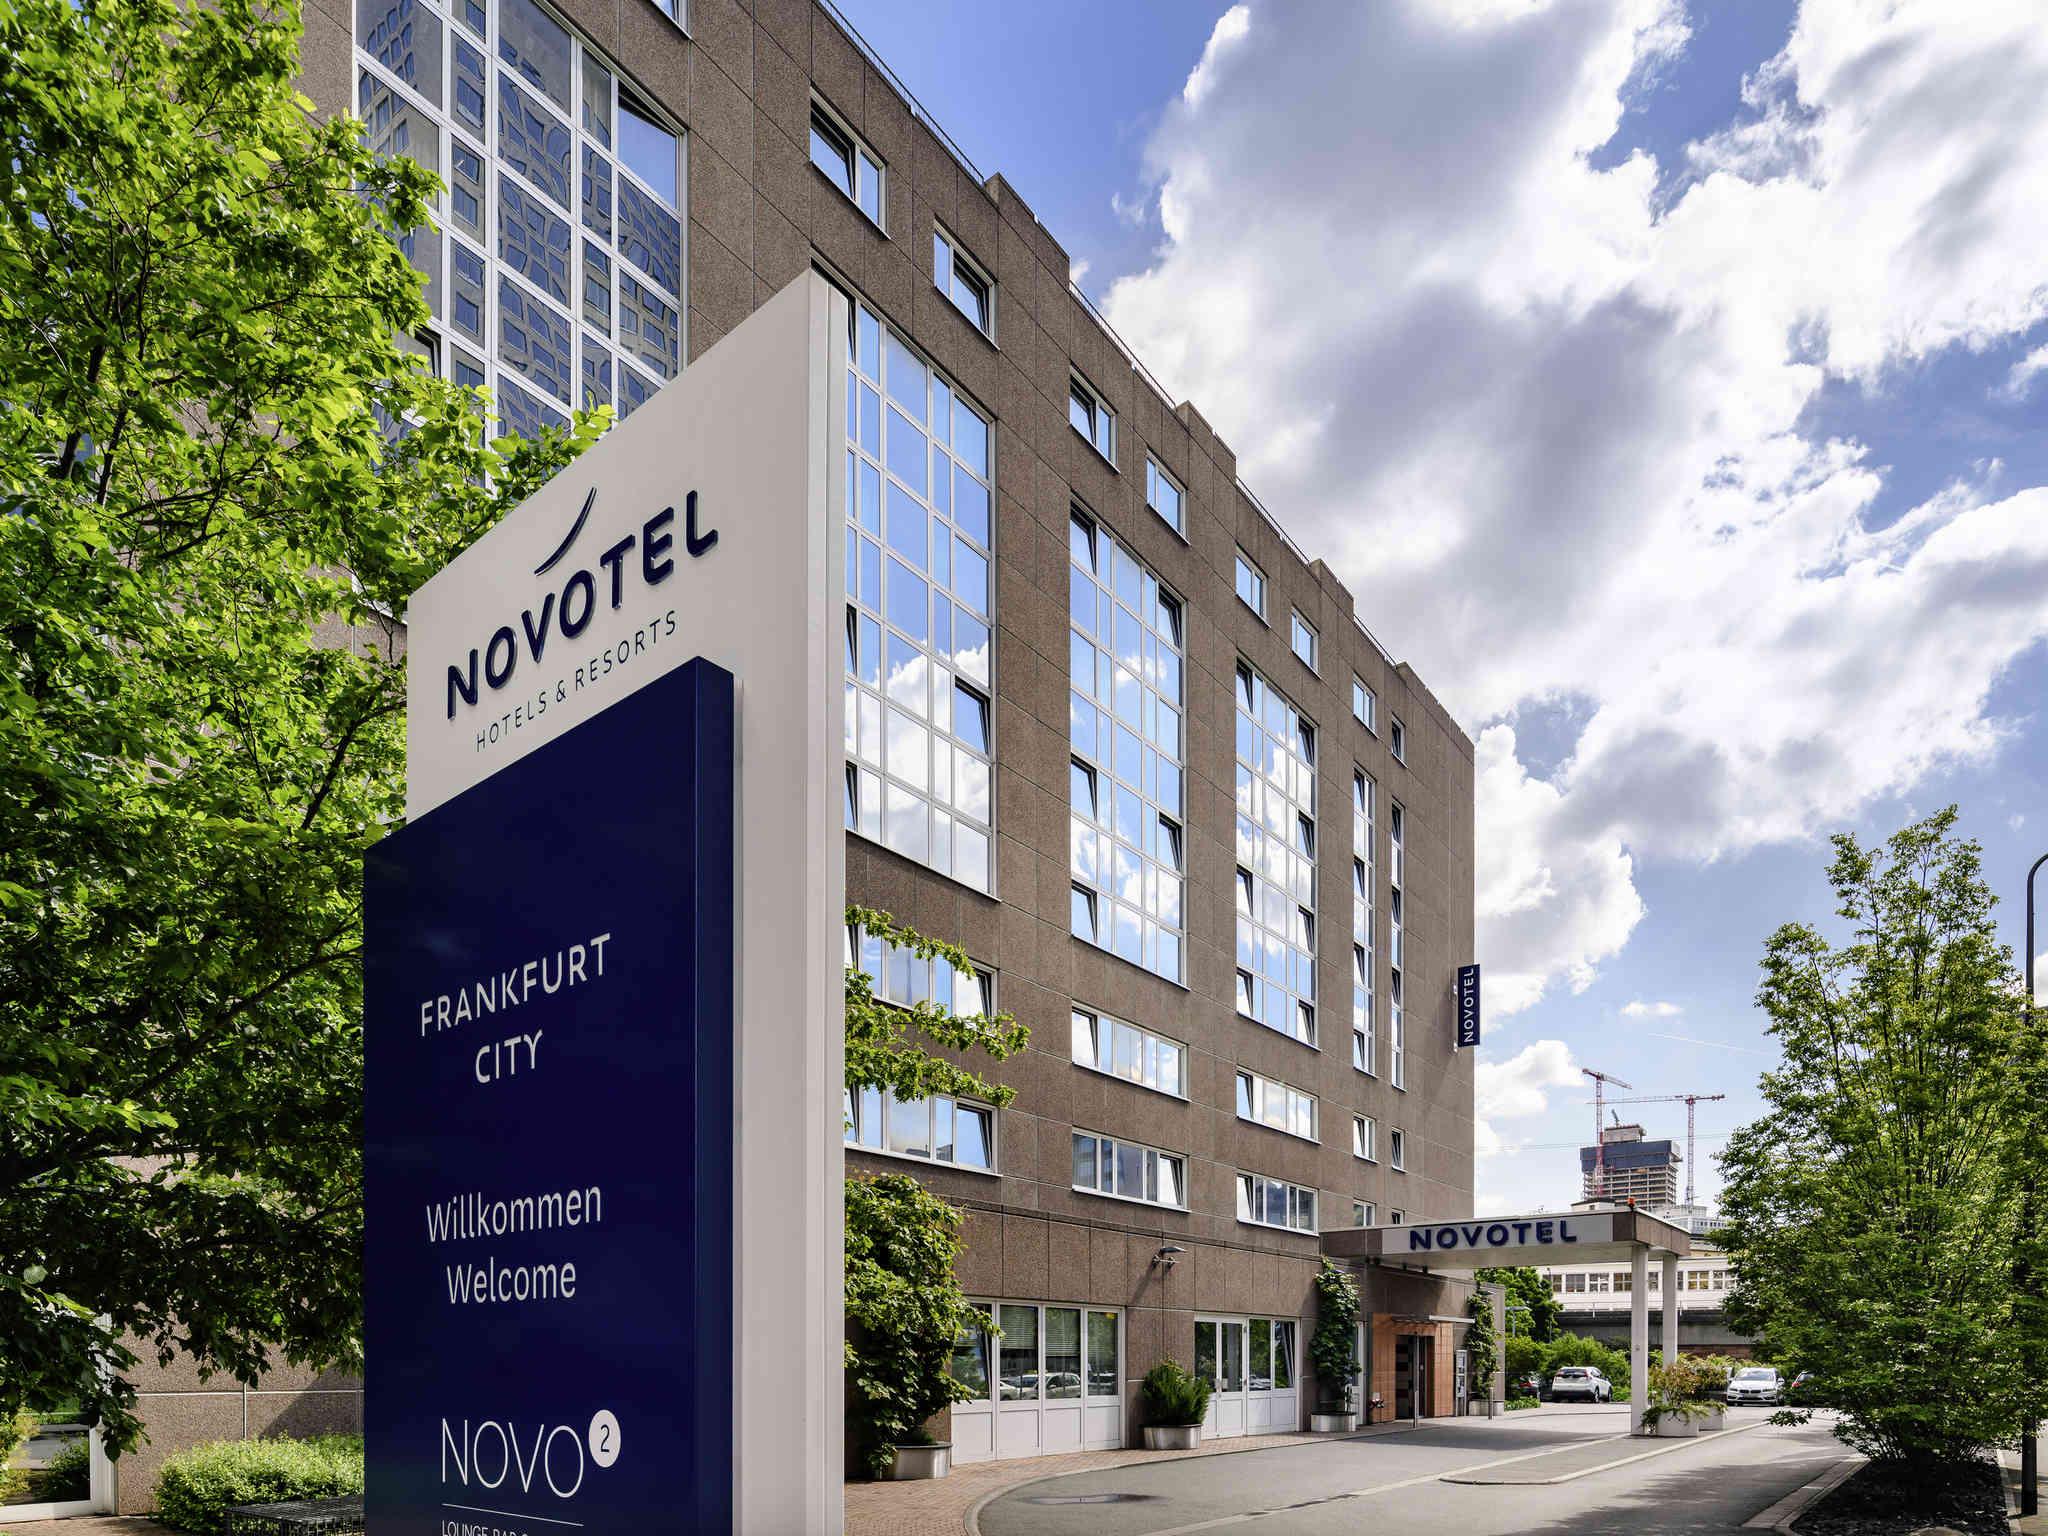 فندق - نوفوتيل Novotel فرانكفورت سيتي